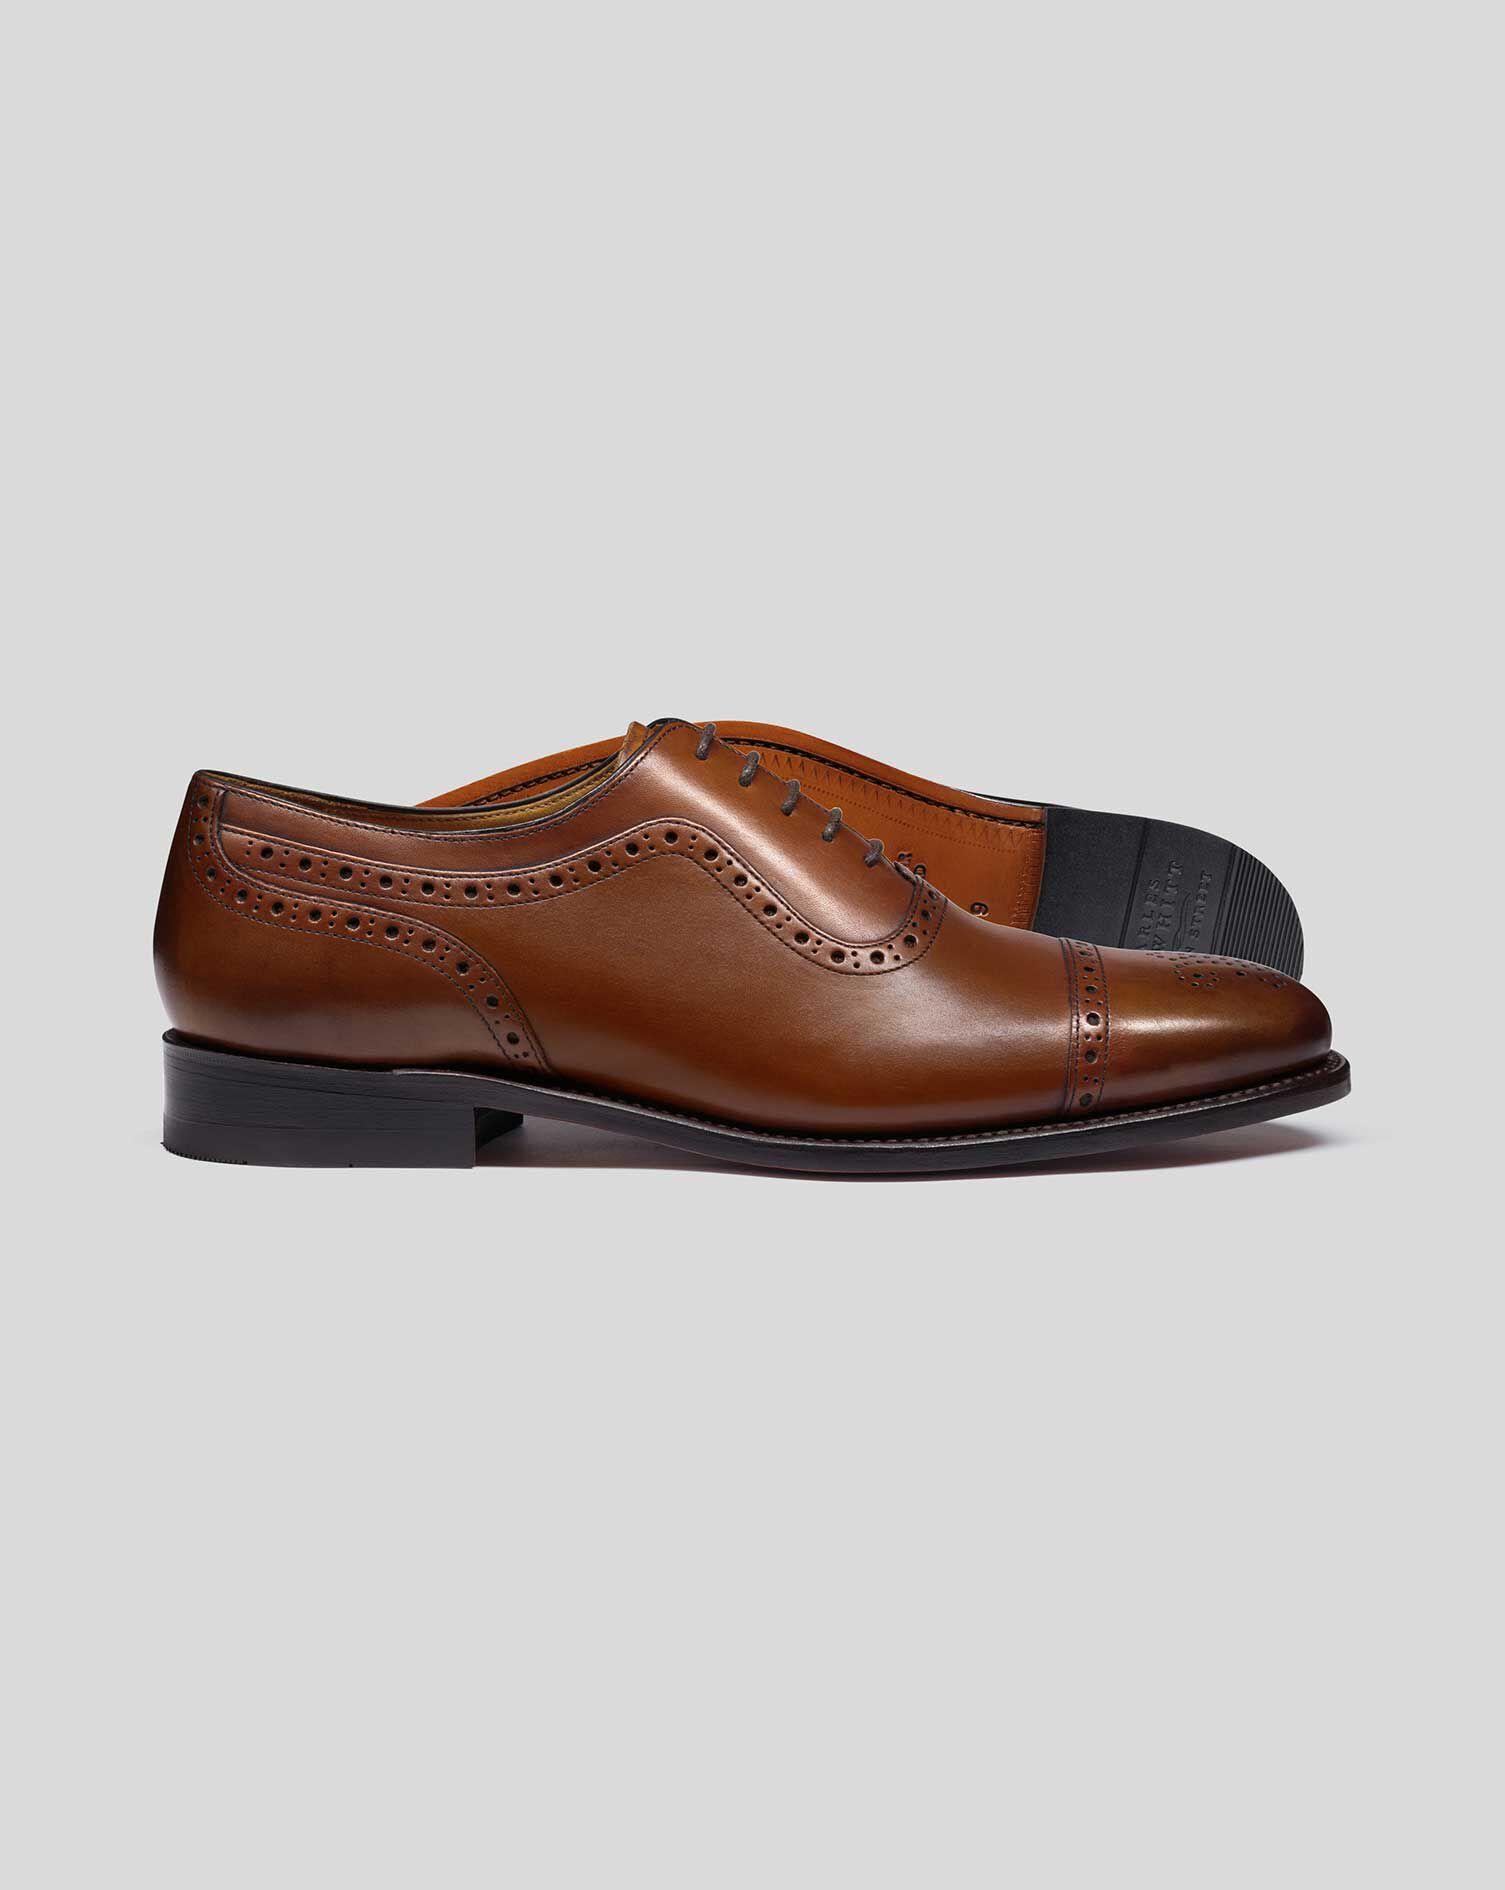 Goodyear rahmengenähte Budapester Oxford Schuhe Braun